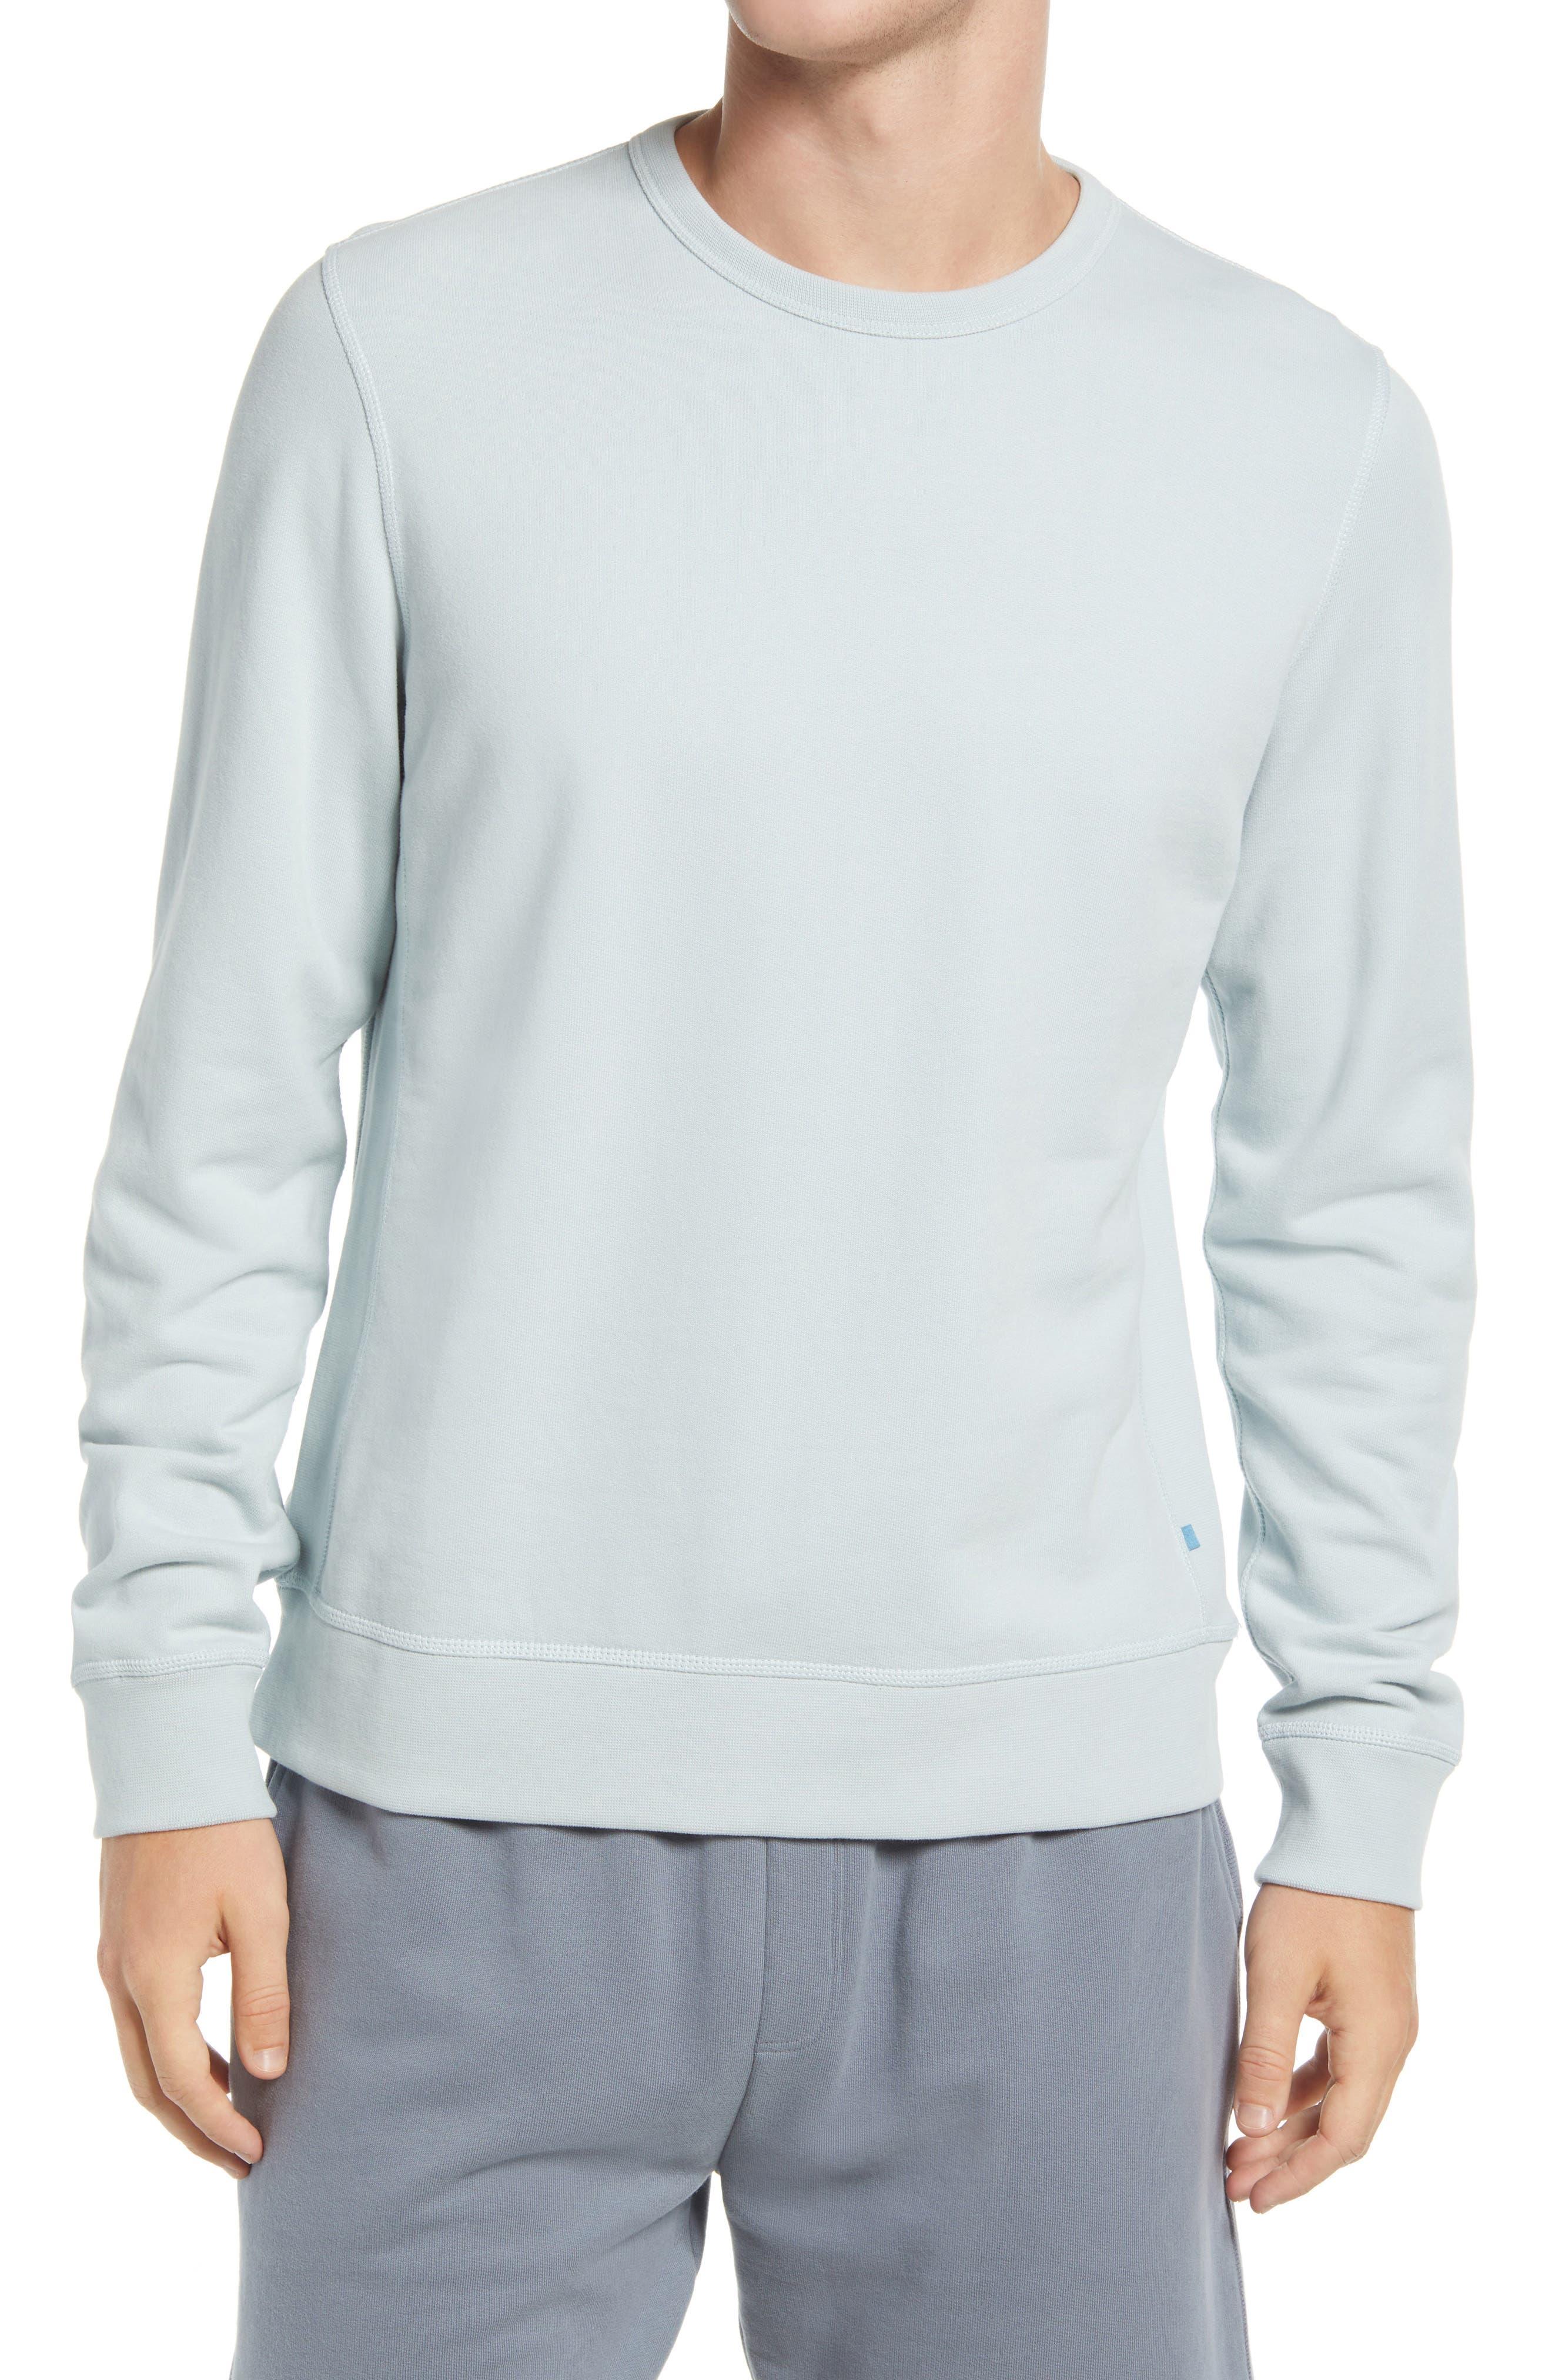 Maddux Crewneck Pima Cotton Sweatshirt